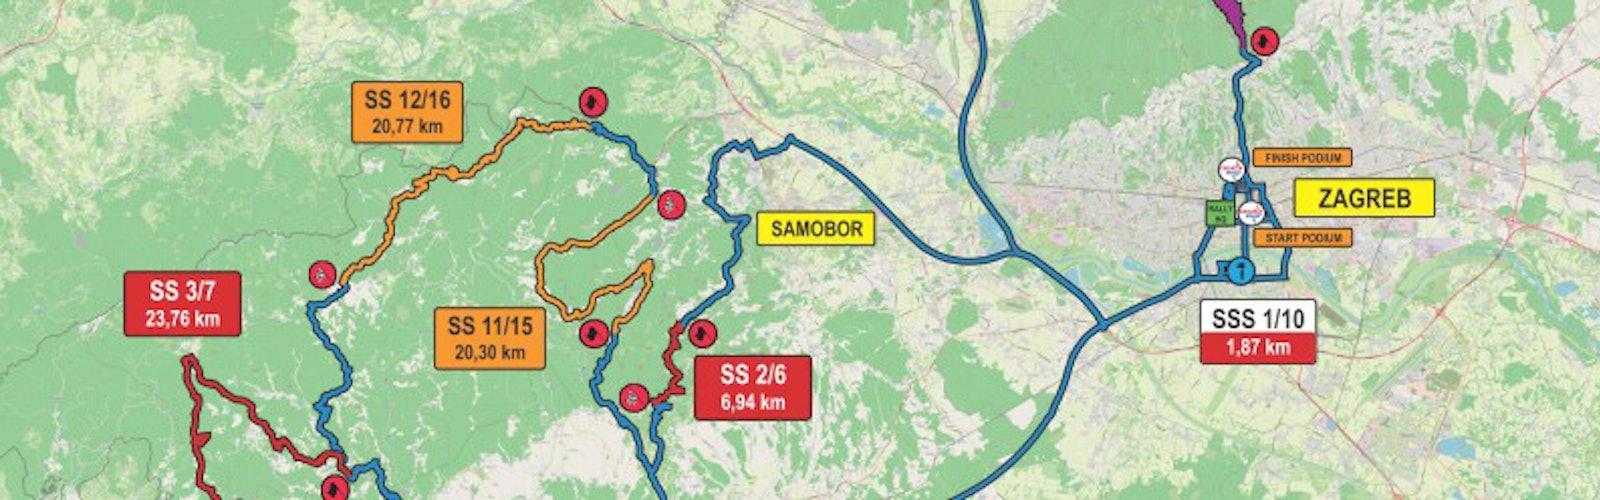 wrc_croatia_2021_stage_map